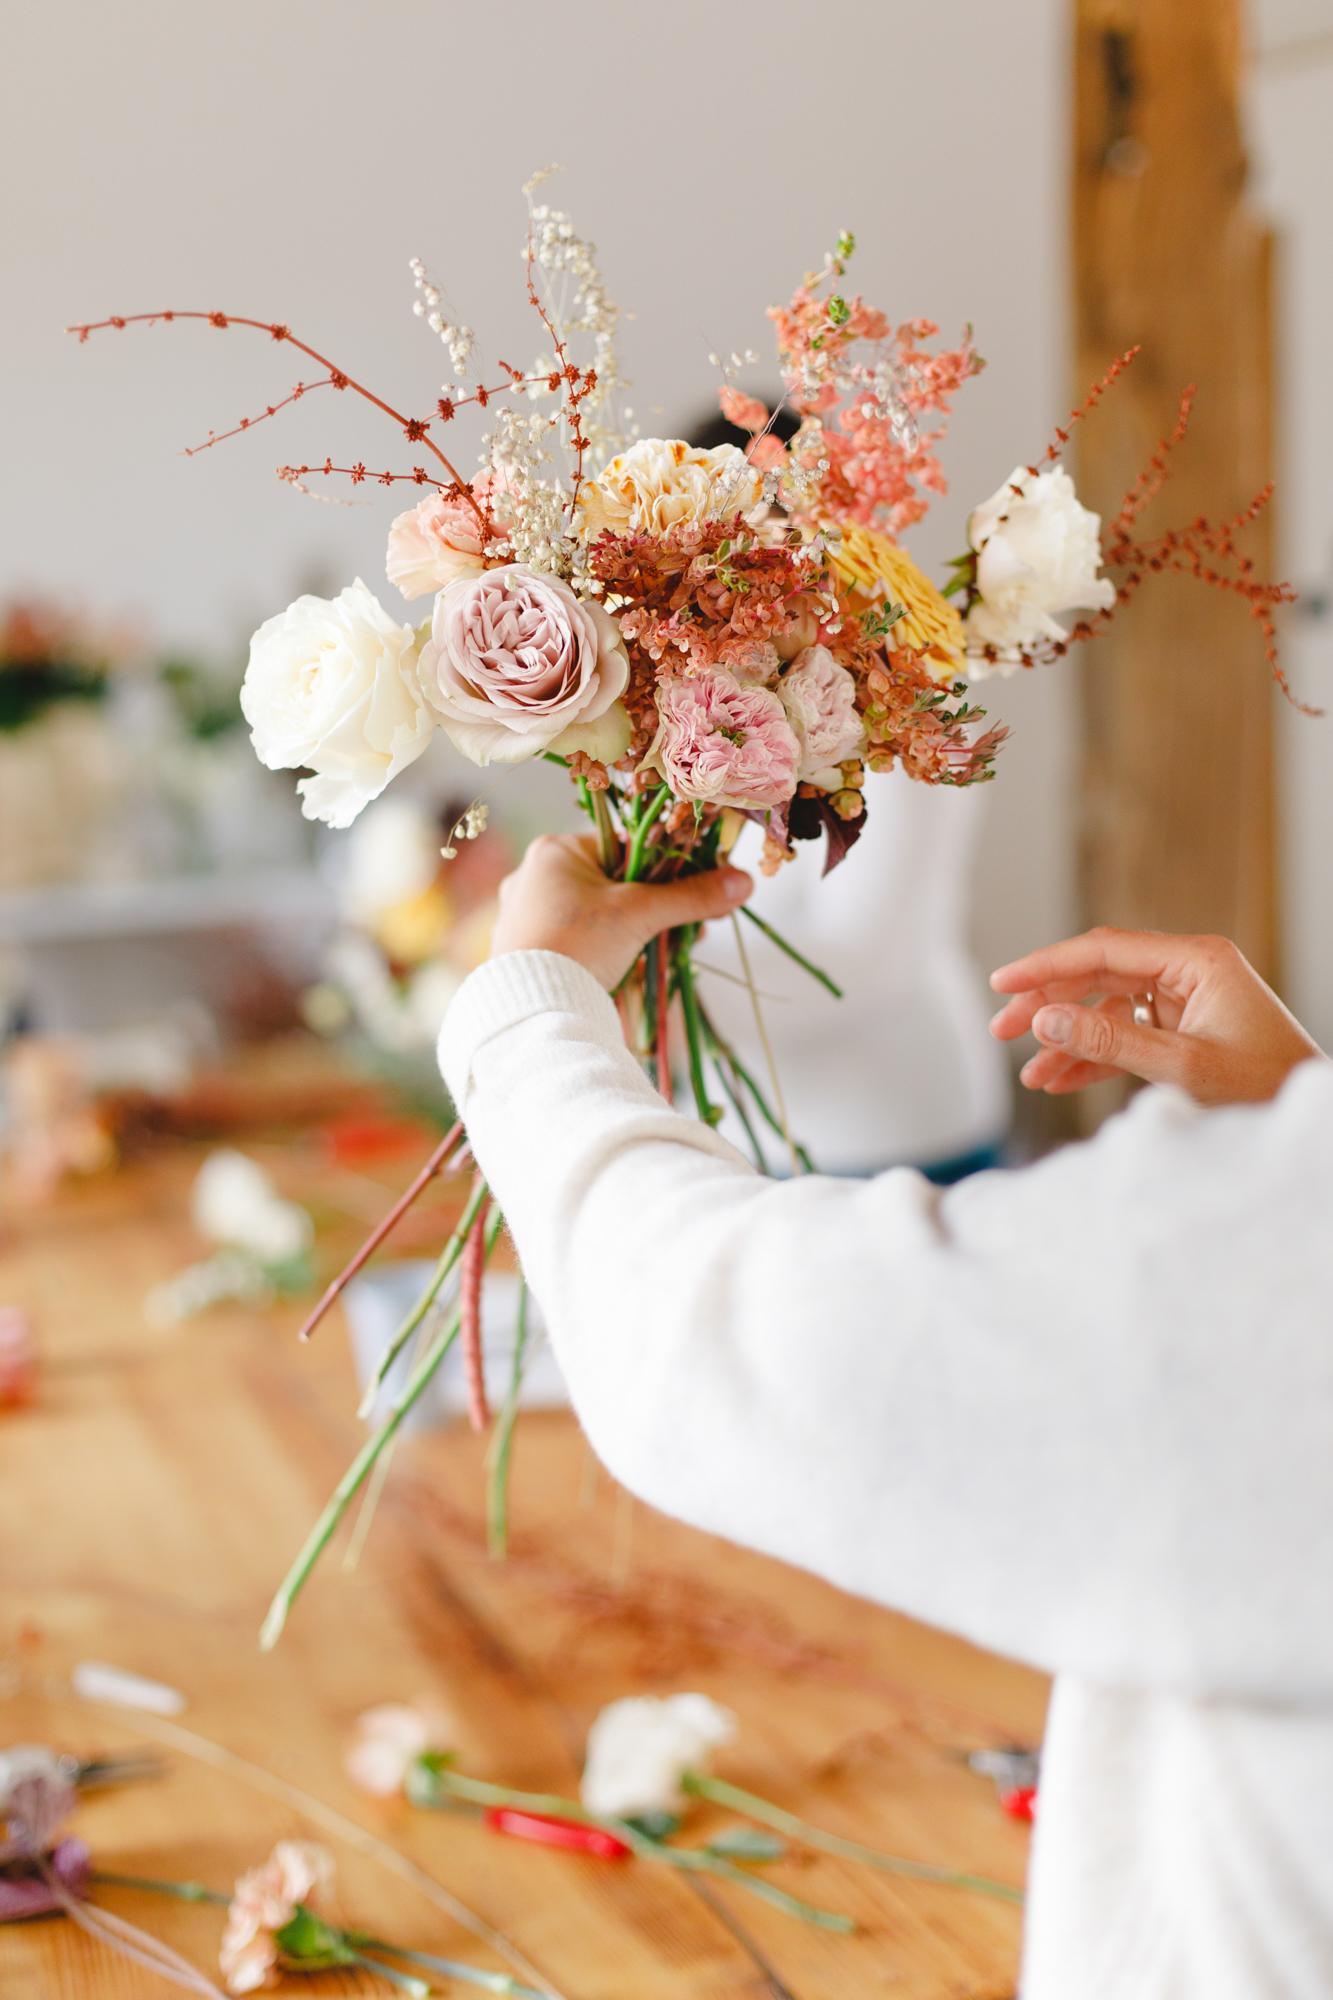 bouquet mariee formation fleuriste fleurs mariage